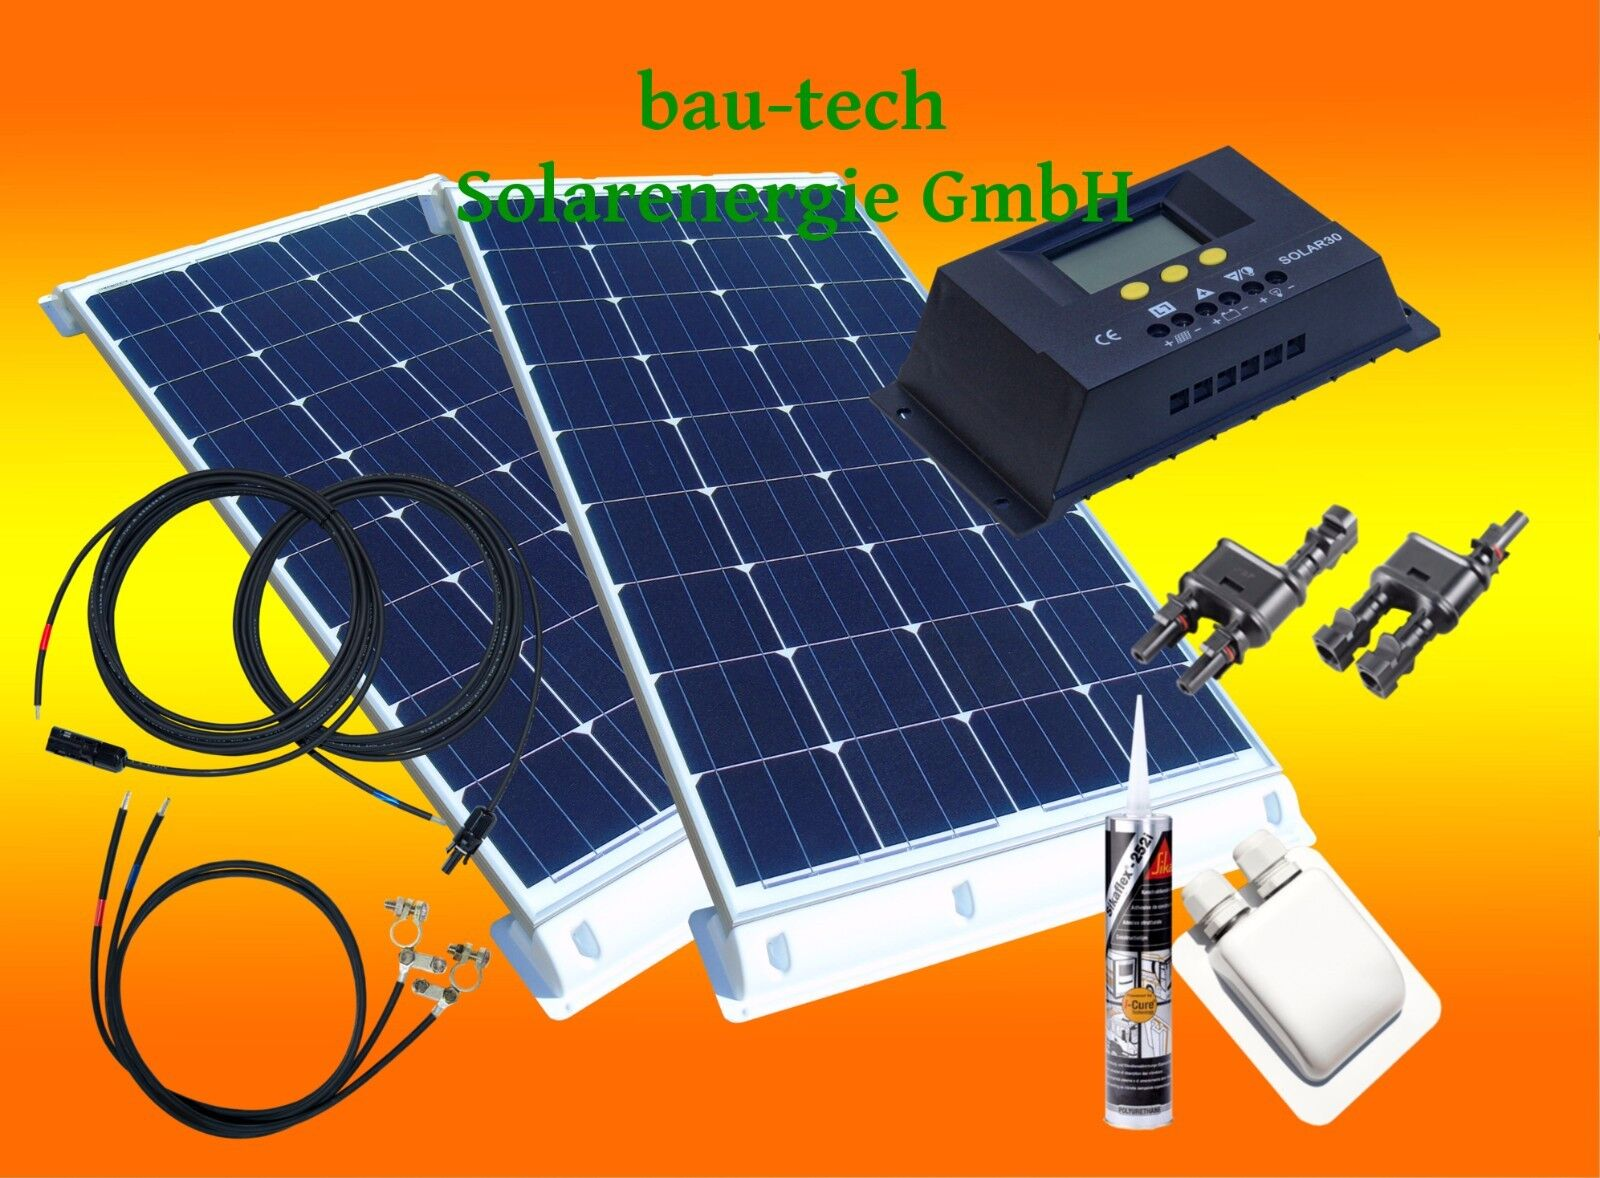 200 Watt Solarmodul Wohnmobil Solaranlage 12 Volt Set 30 Ampere Laderegler